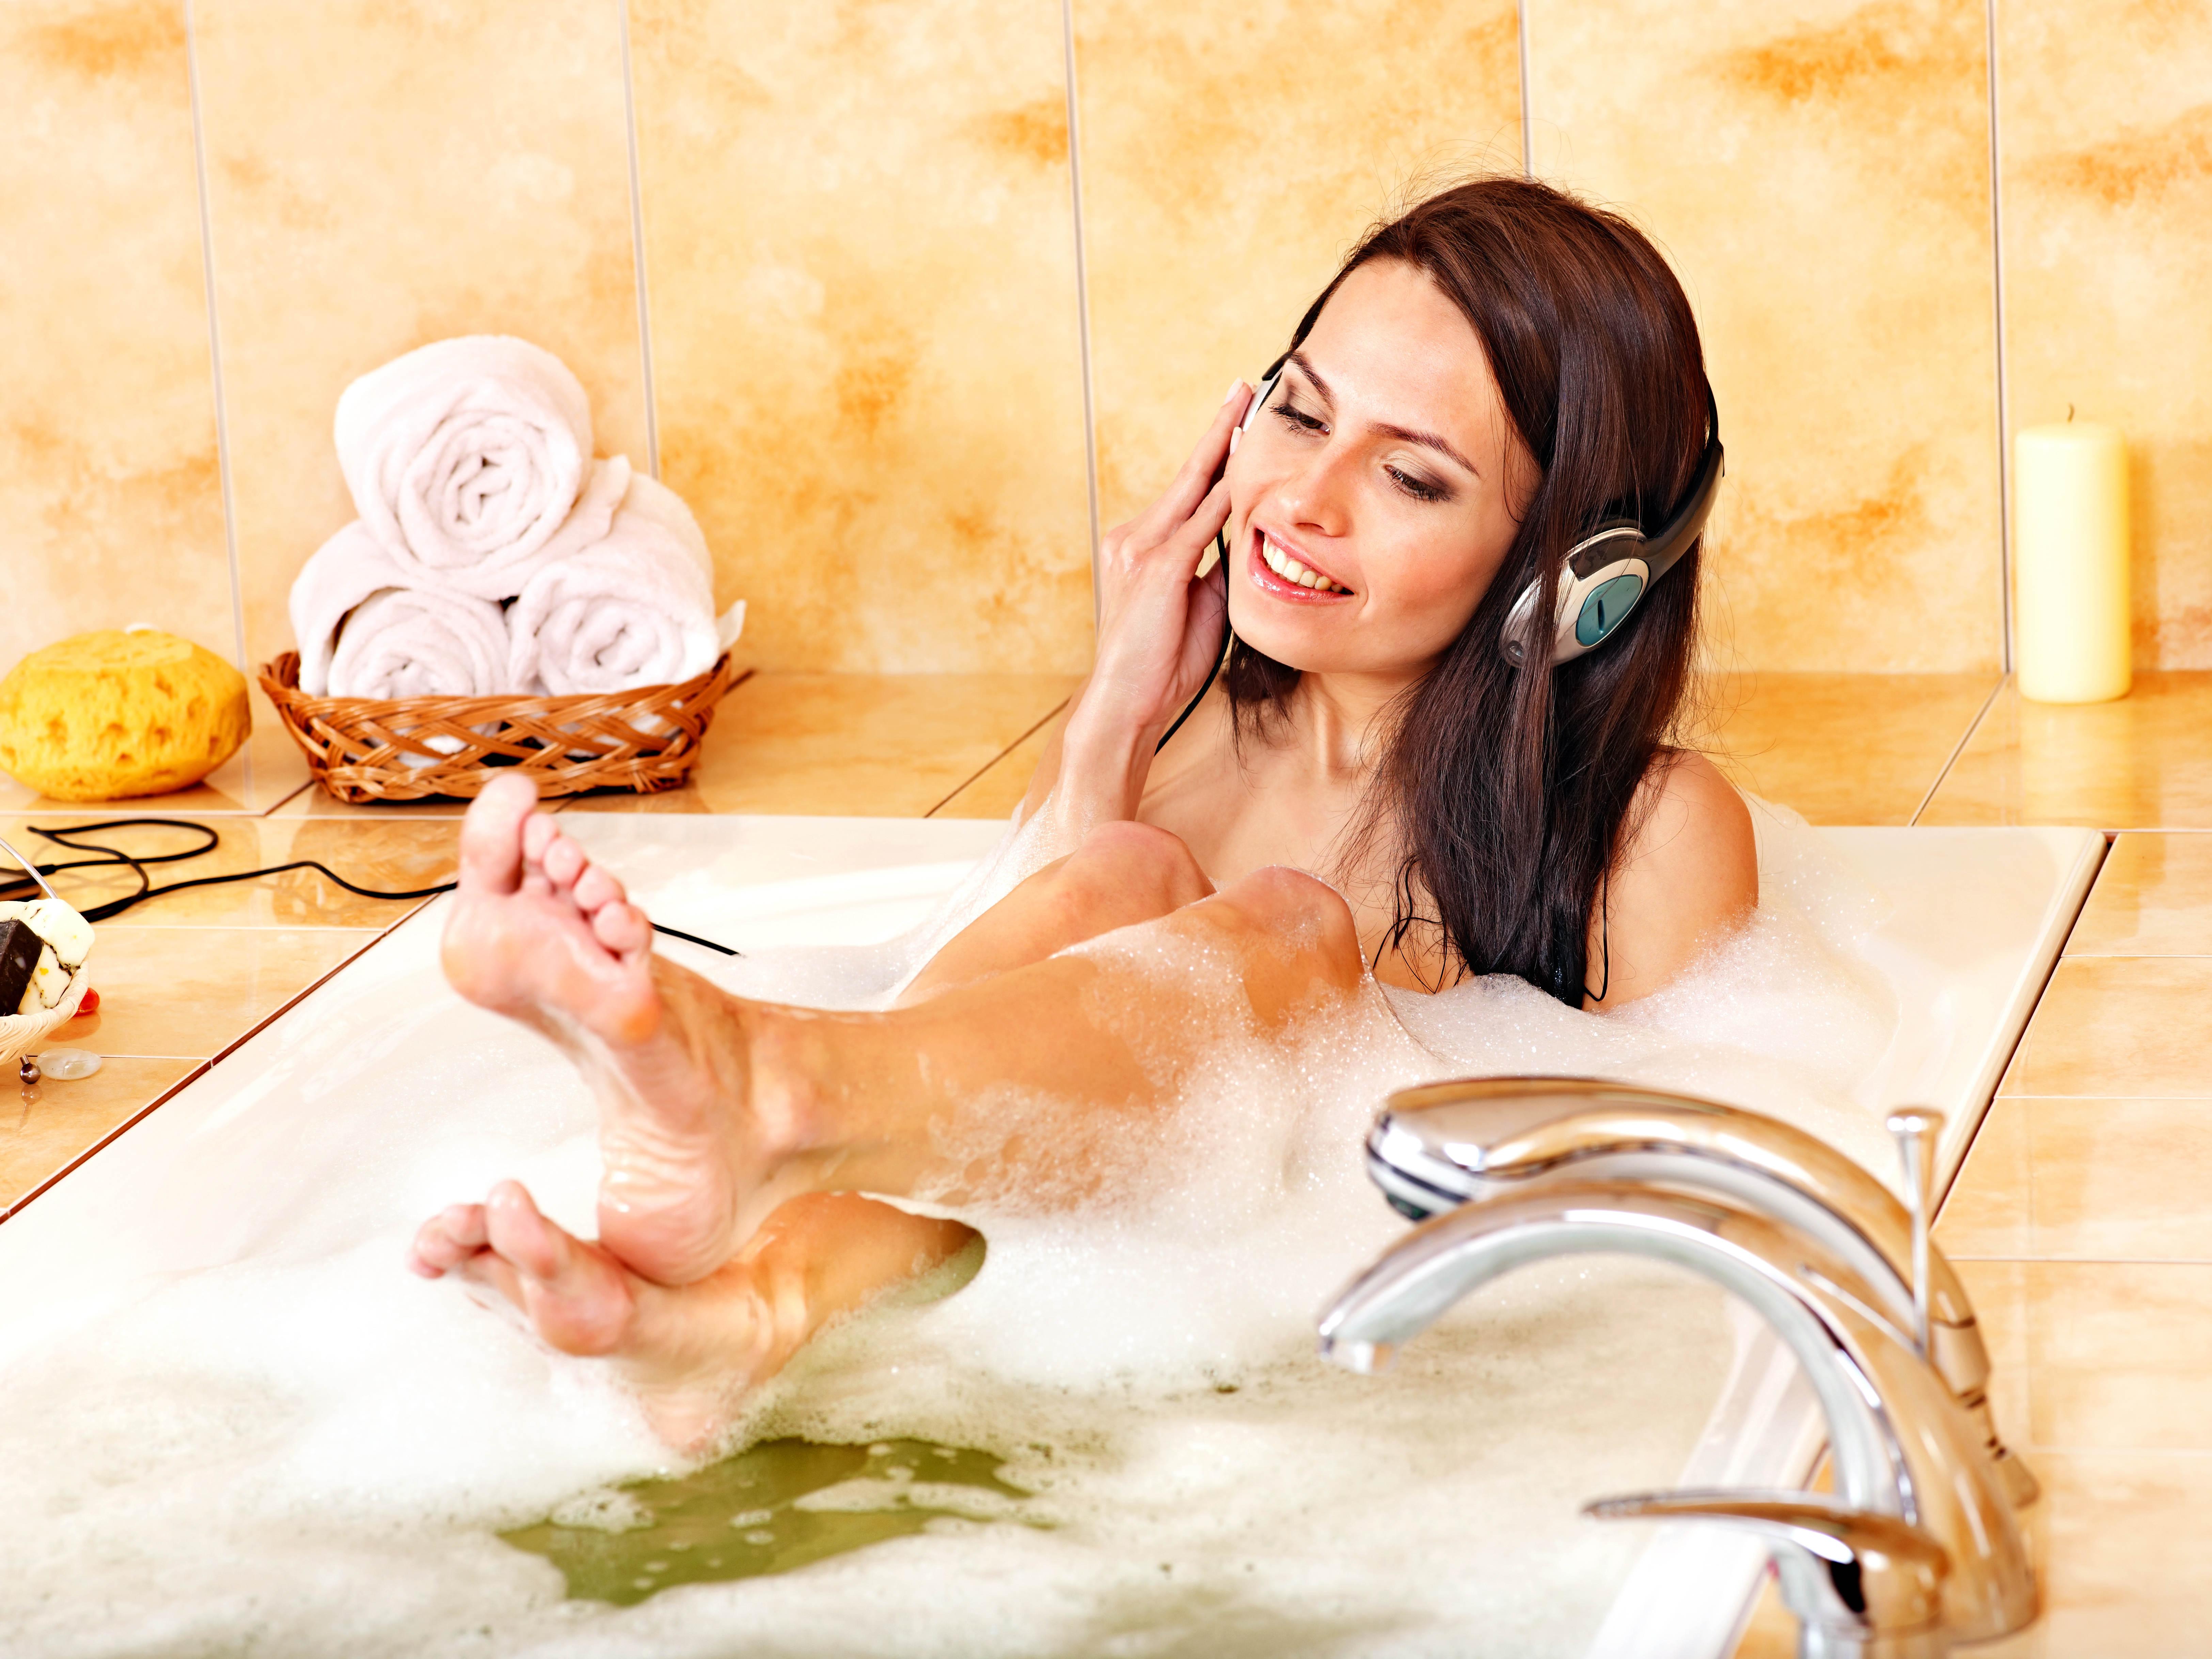 Фото девушки в ванне красивое 2 фотография